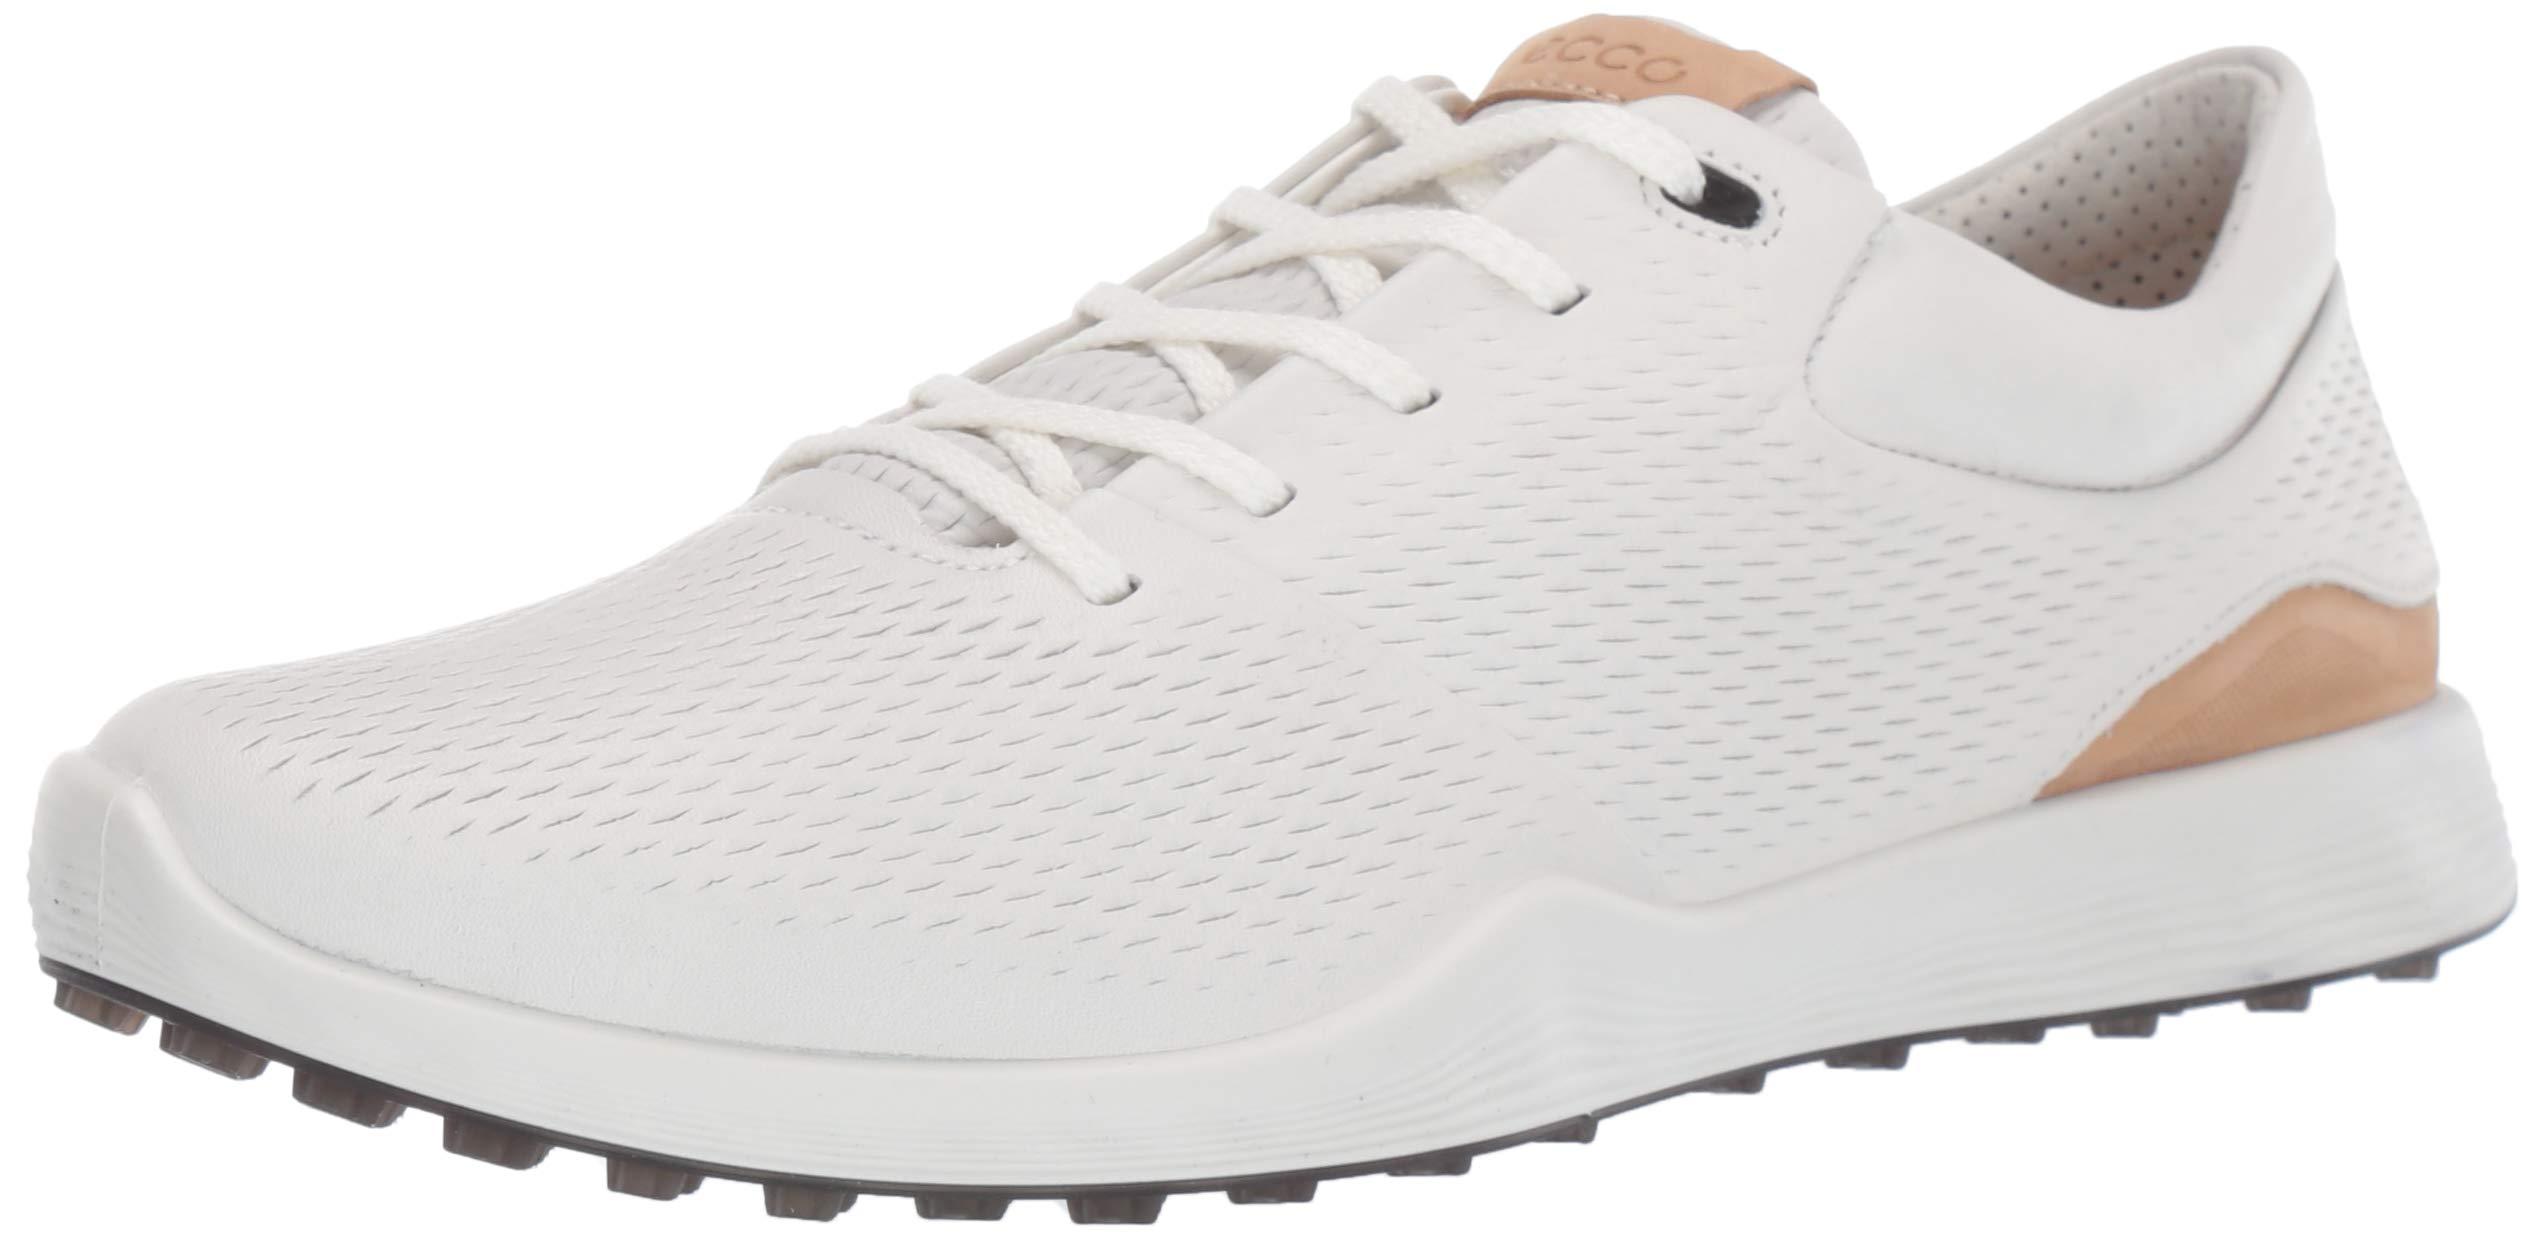 ECCO Women's S-Lite Golf Shoe, White Yak Leather, 11 M US by ECCO